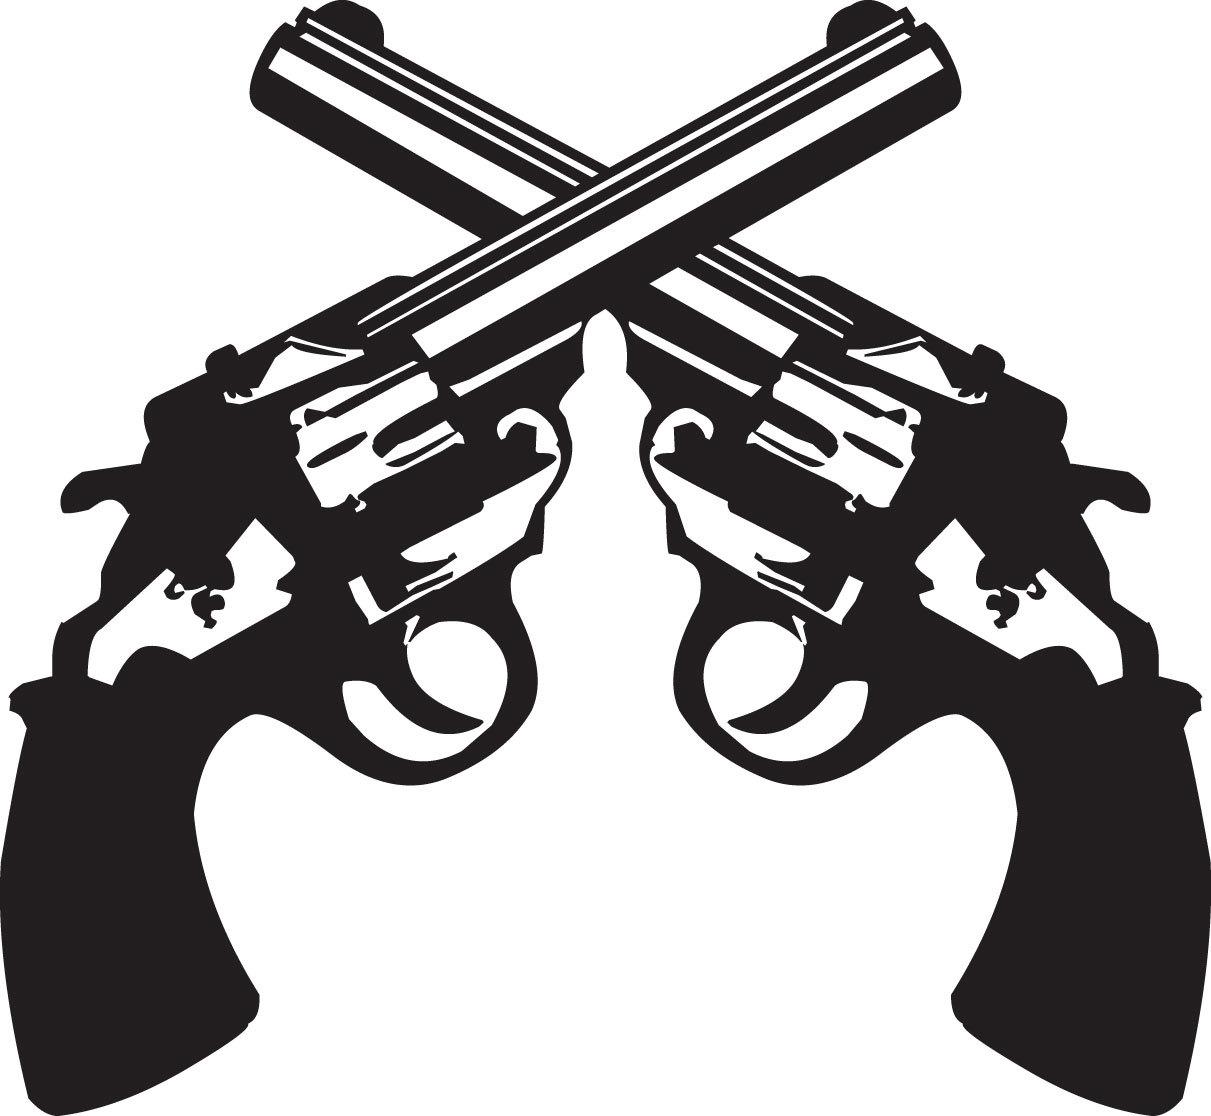 Shotgun clipart trap shooting Cliparts Drawing Guns Clipart Crossing